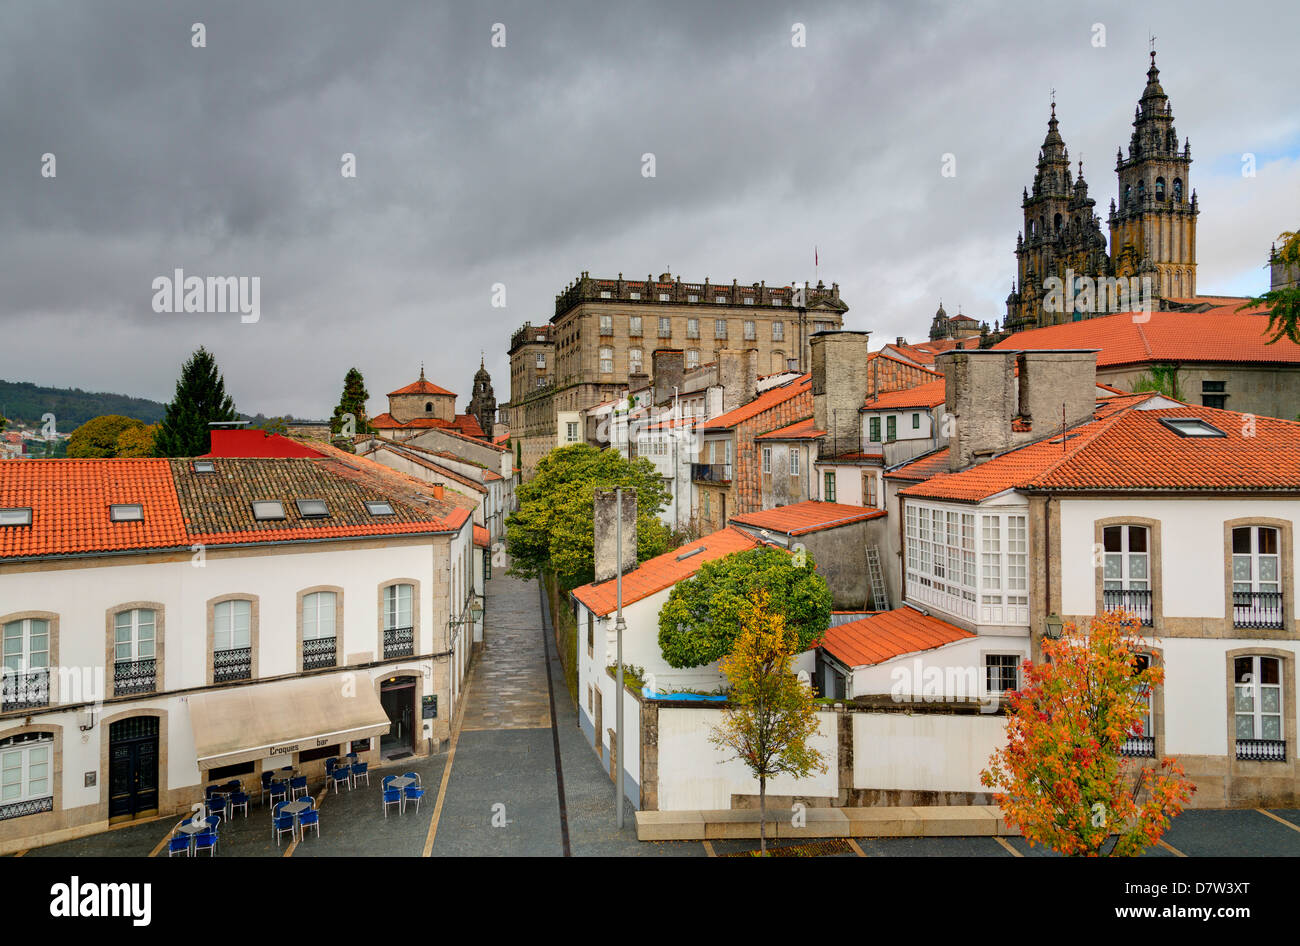 Old Town, Santiago de Compostela, UNESCO World Heritage Site, Galicia, Spain Stock Photo